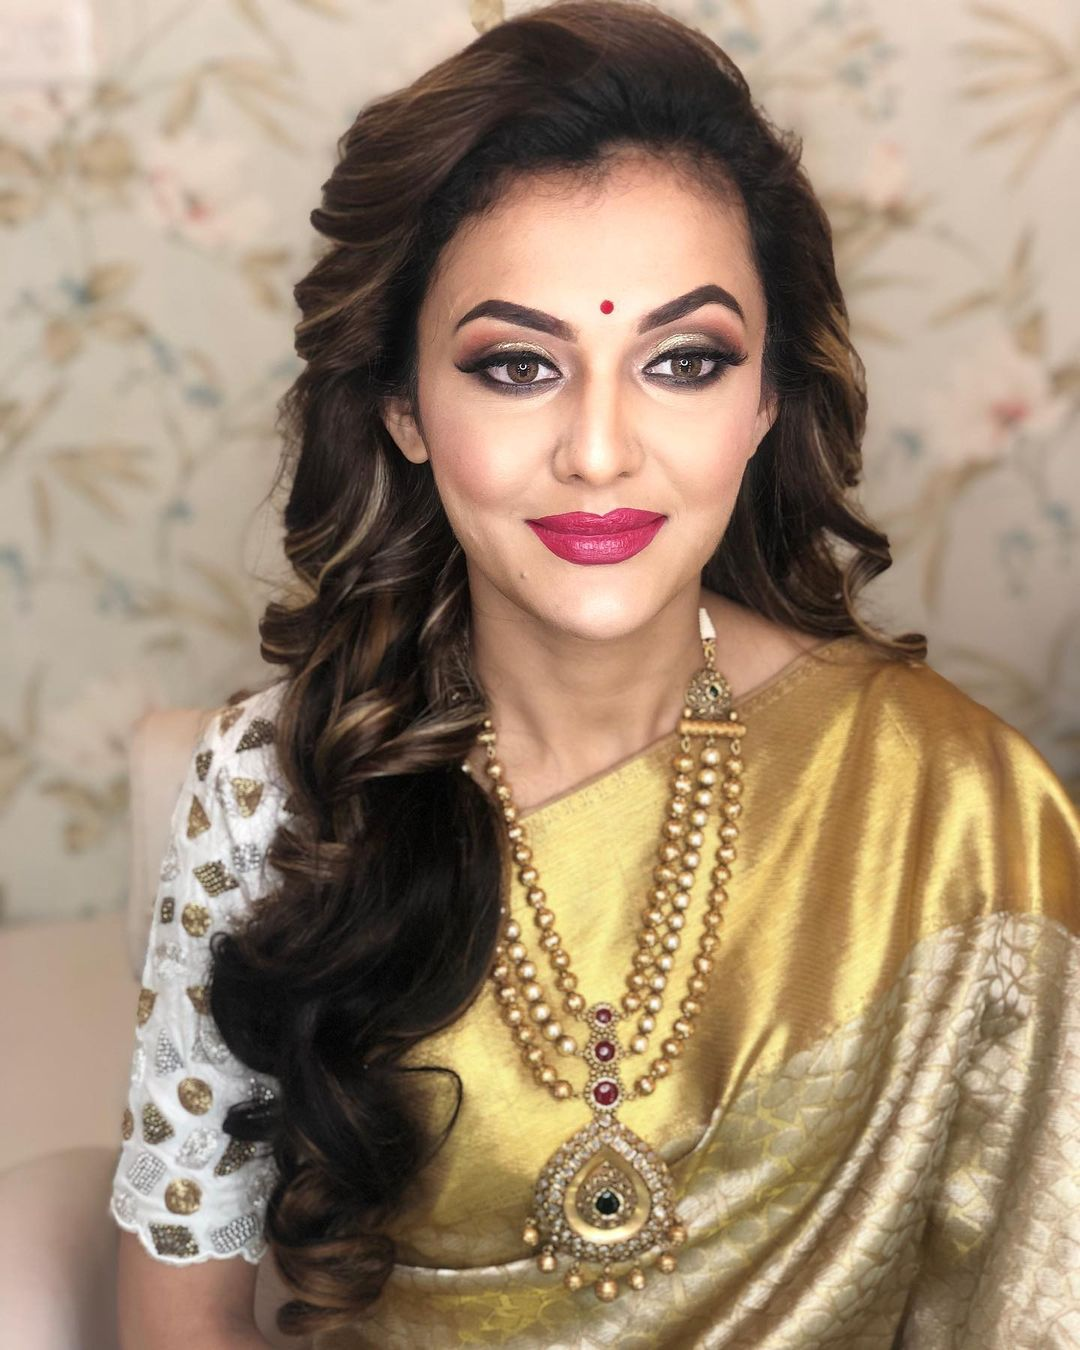 Golden Saree Marathi Bride Makeup By Tejaswini Pune